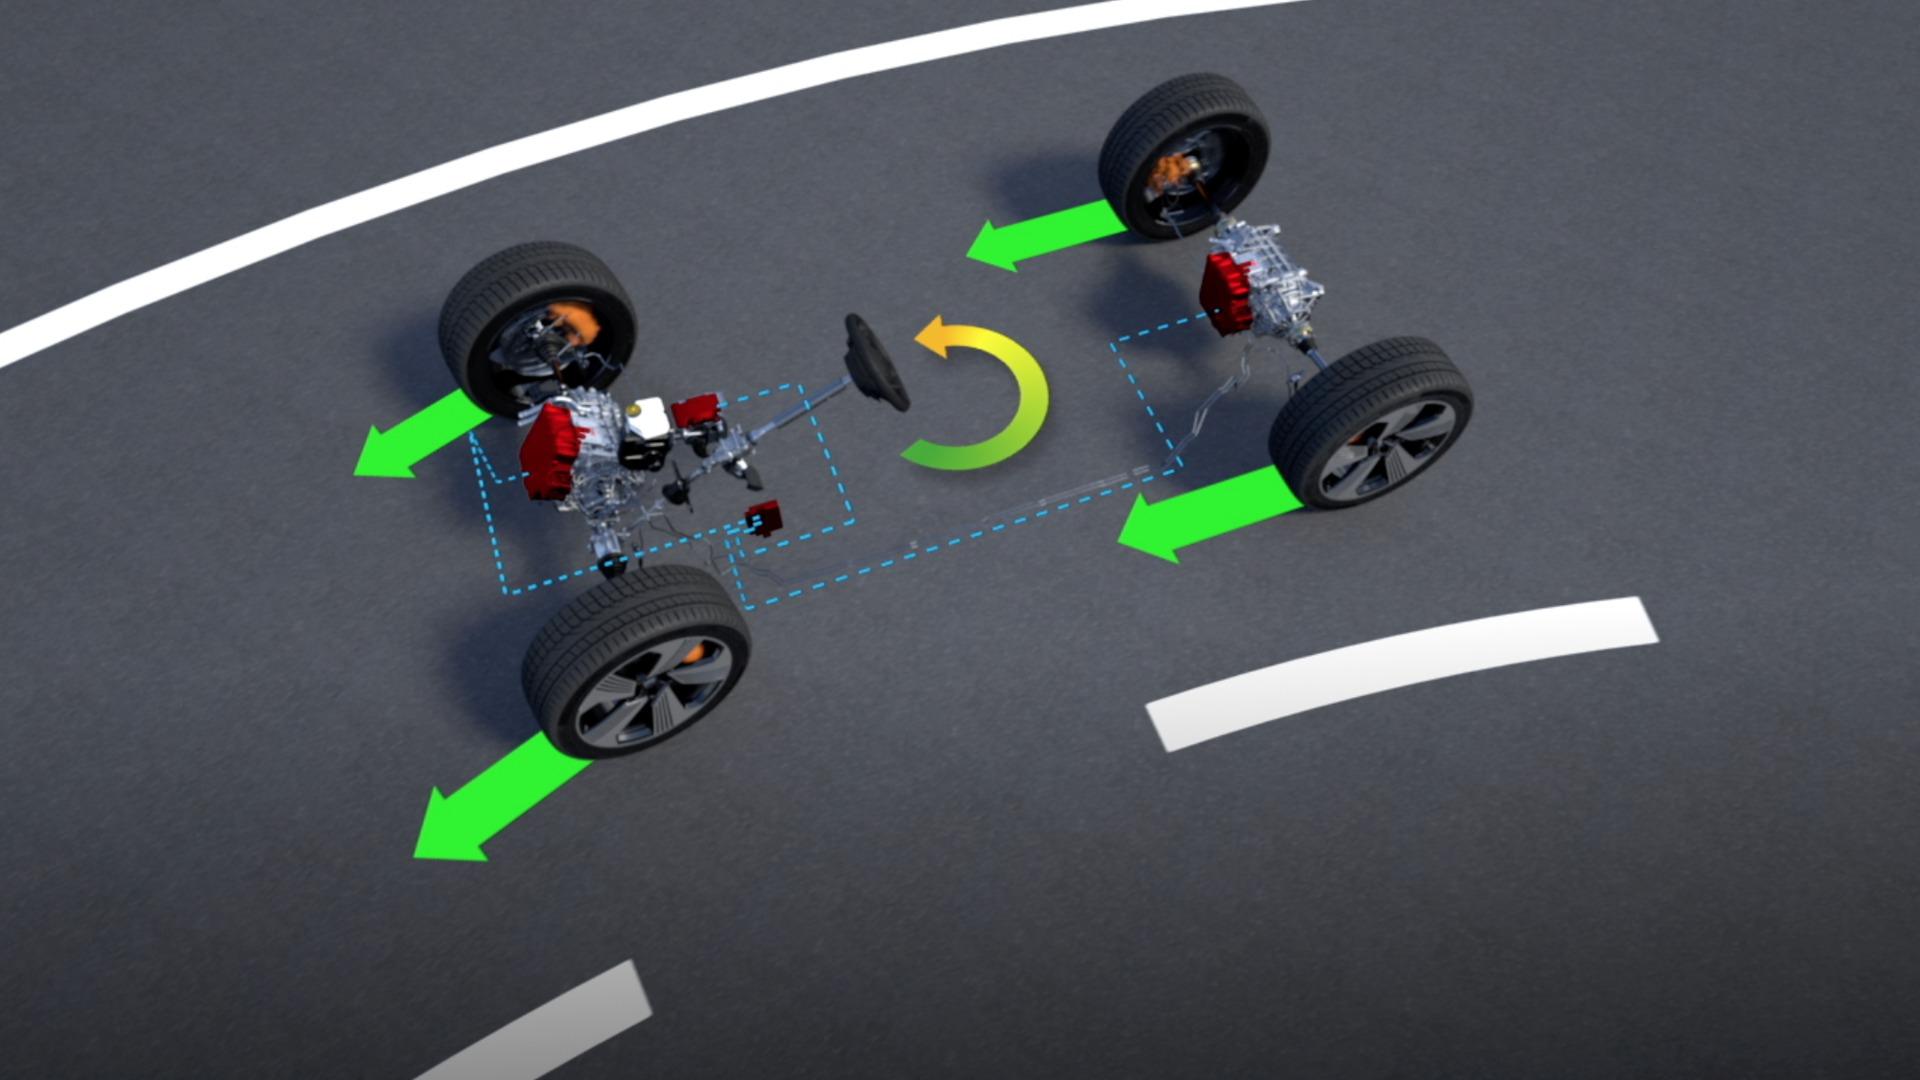 Elektrischer quattro des Audi e-tron (Animation)